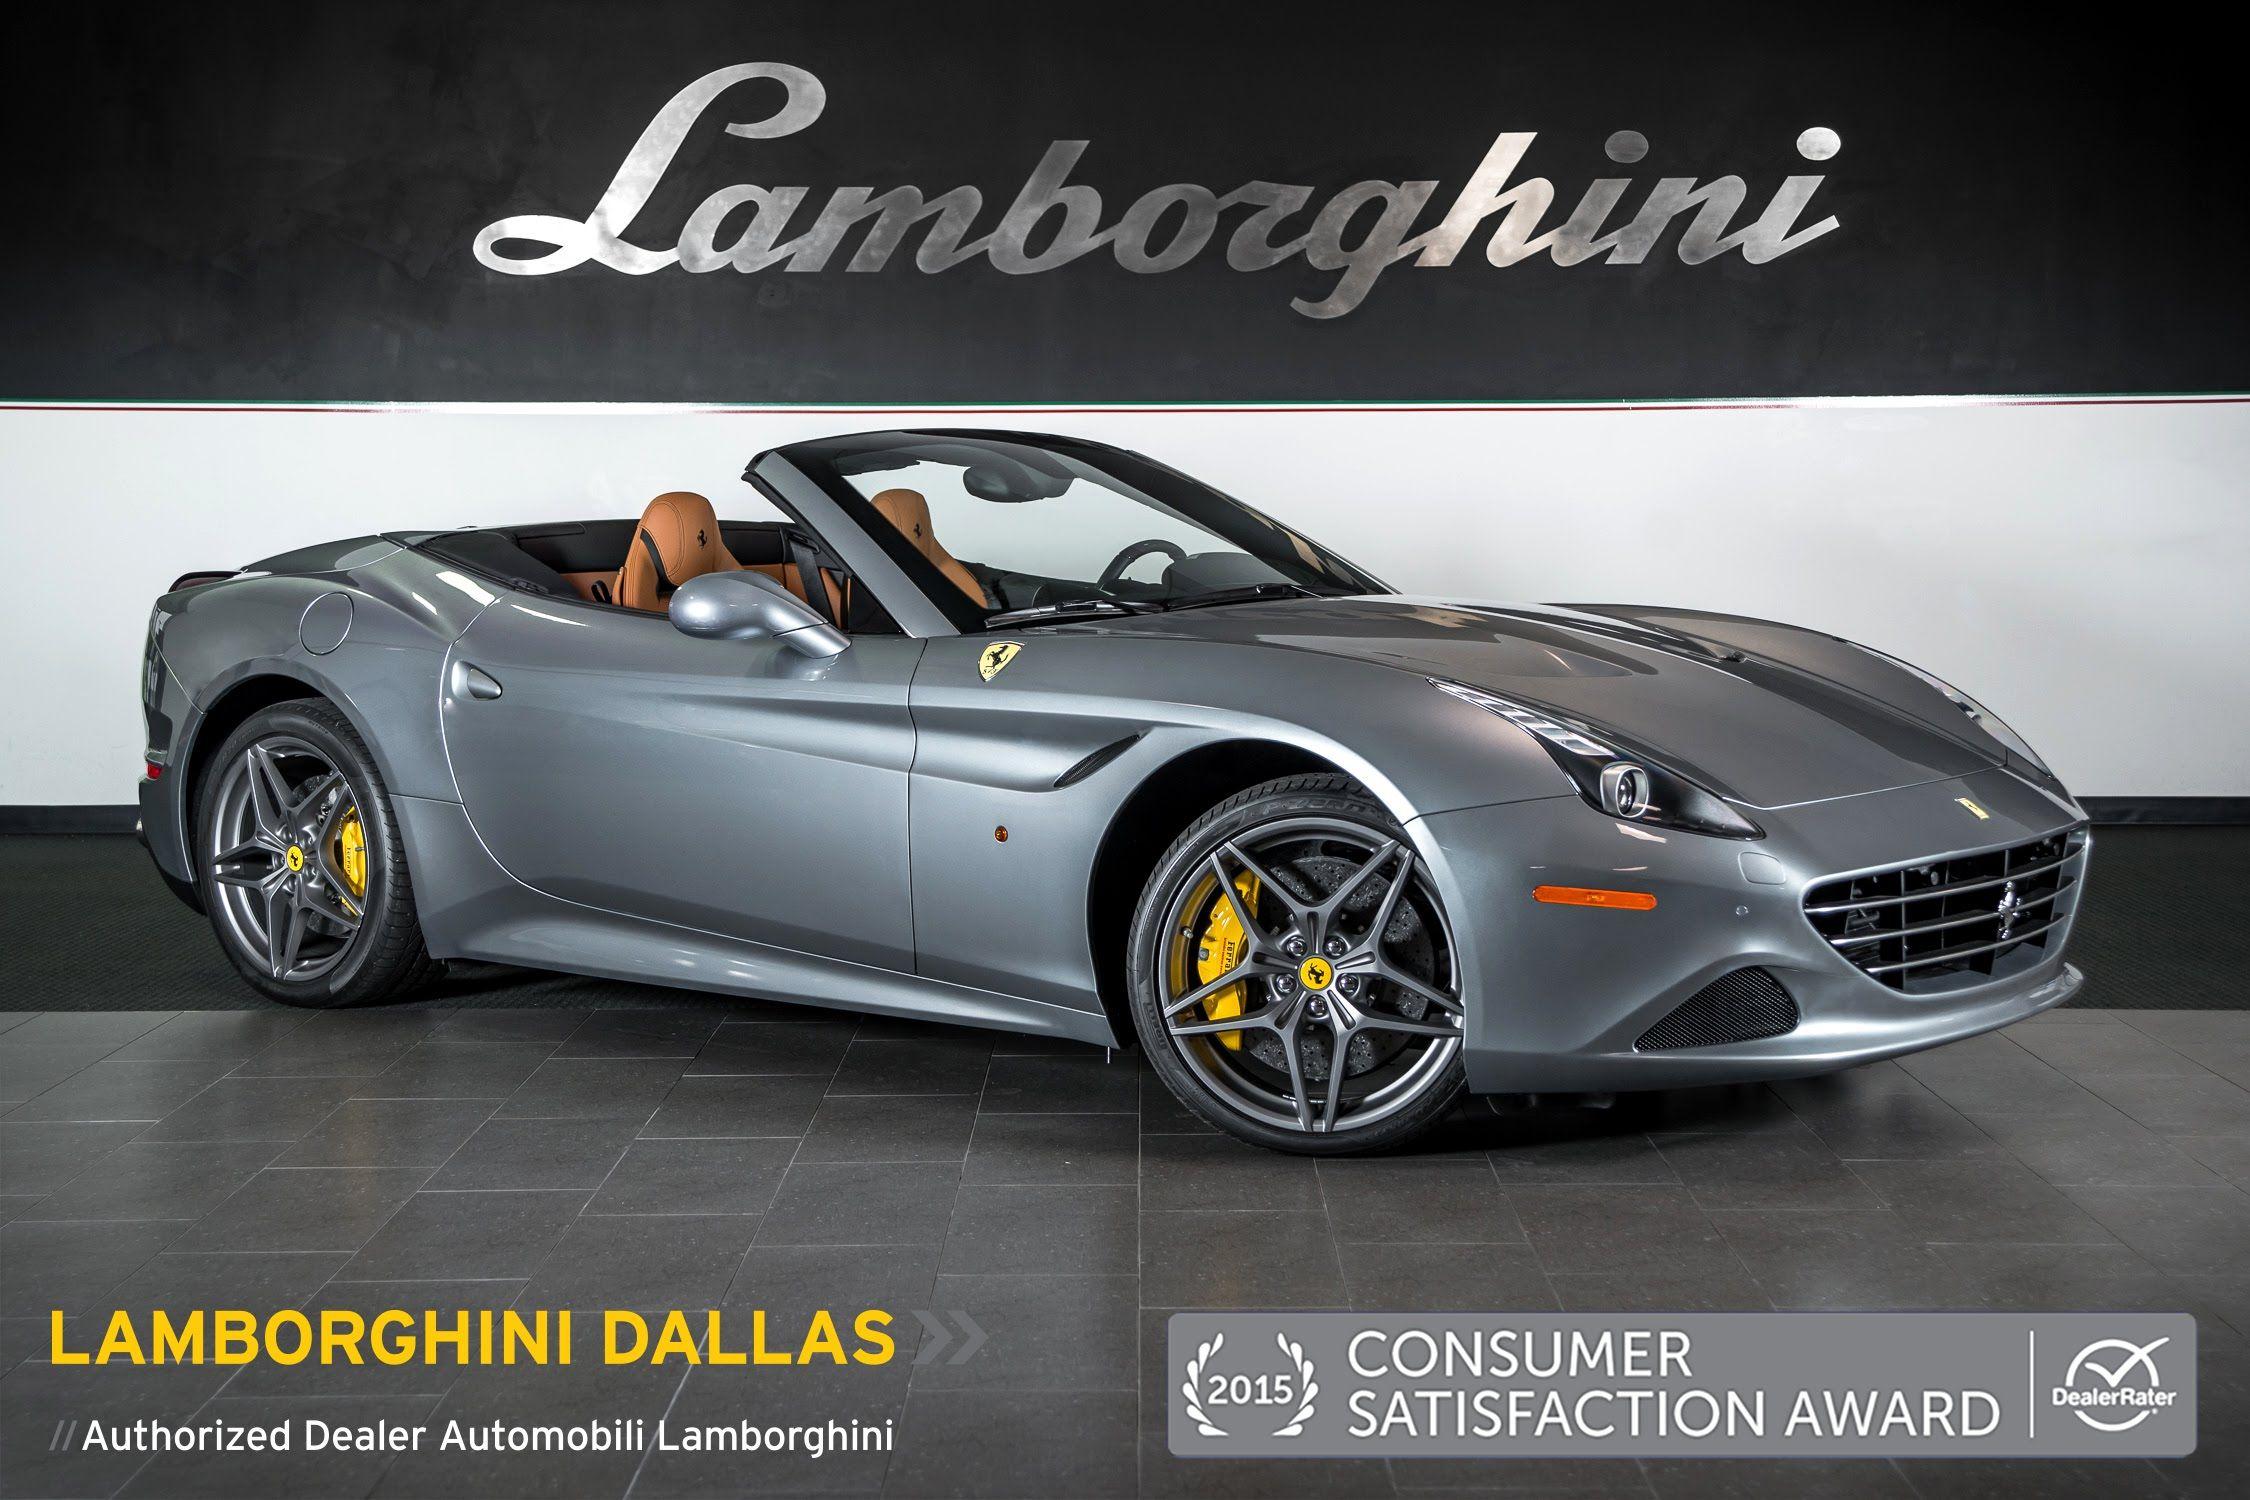 1c00528d64f2a9c8399ab9e75608ba61 Fabulous Ferrari Mondial T In Vendita Cars Trend